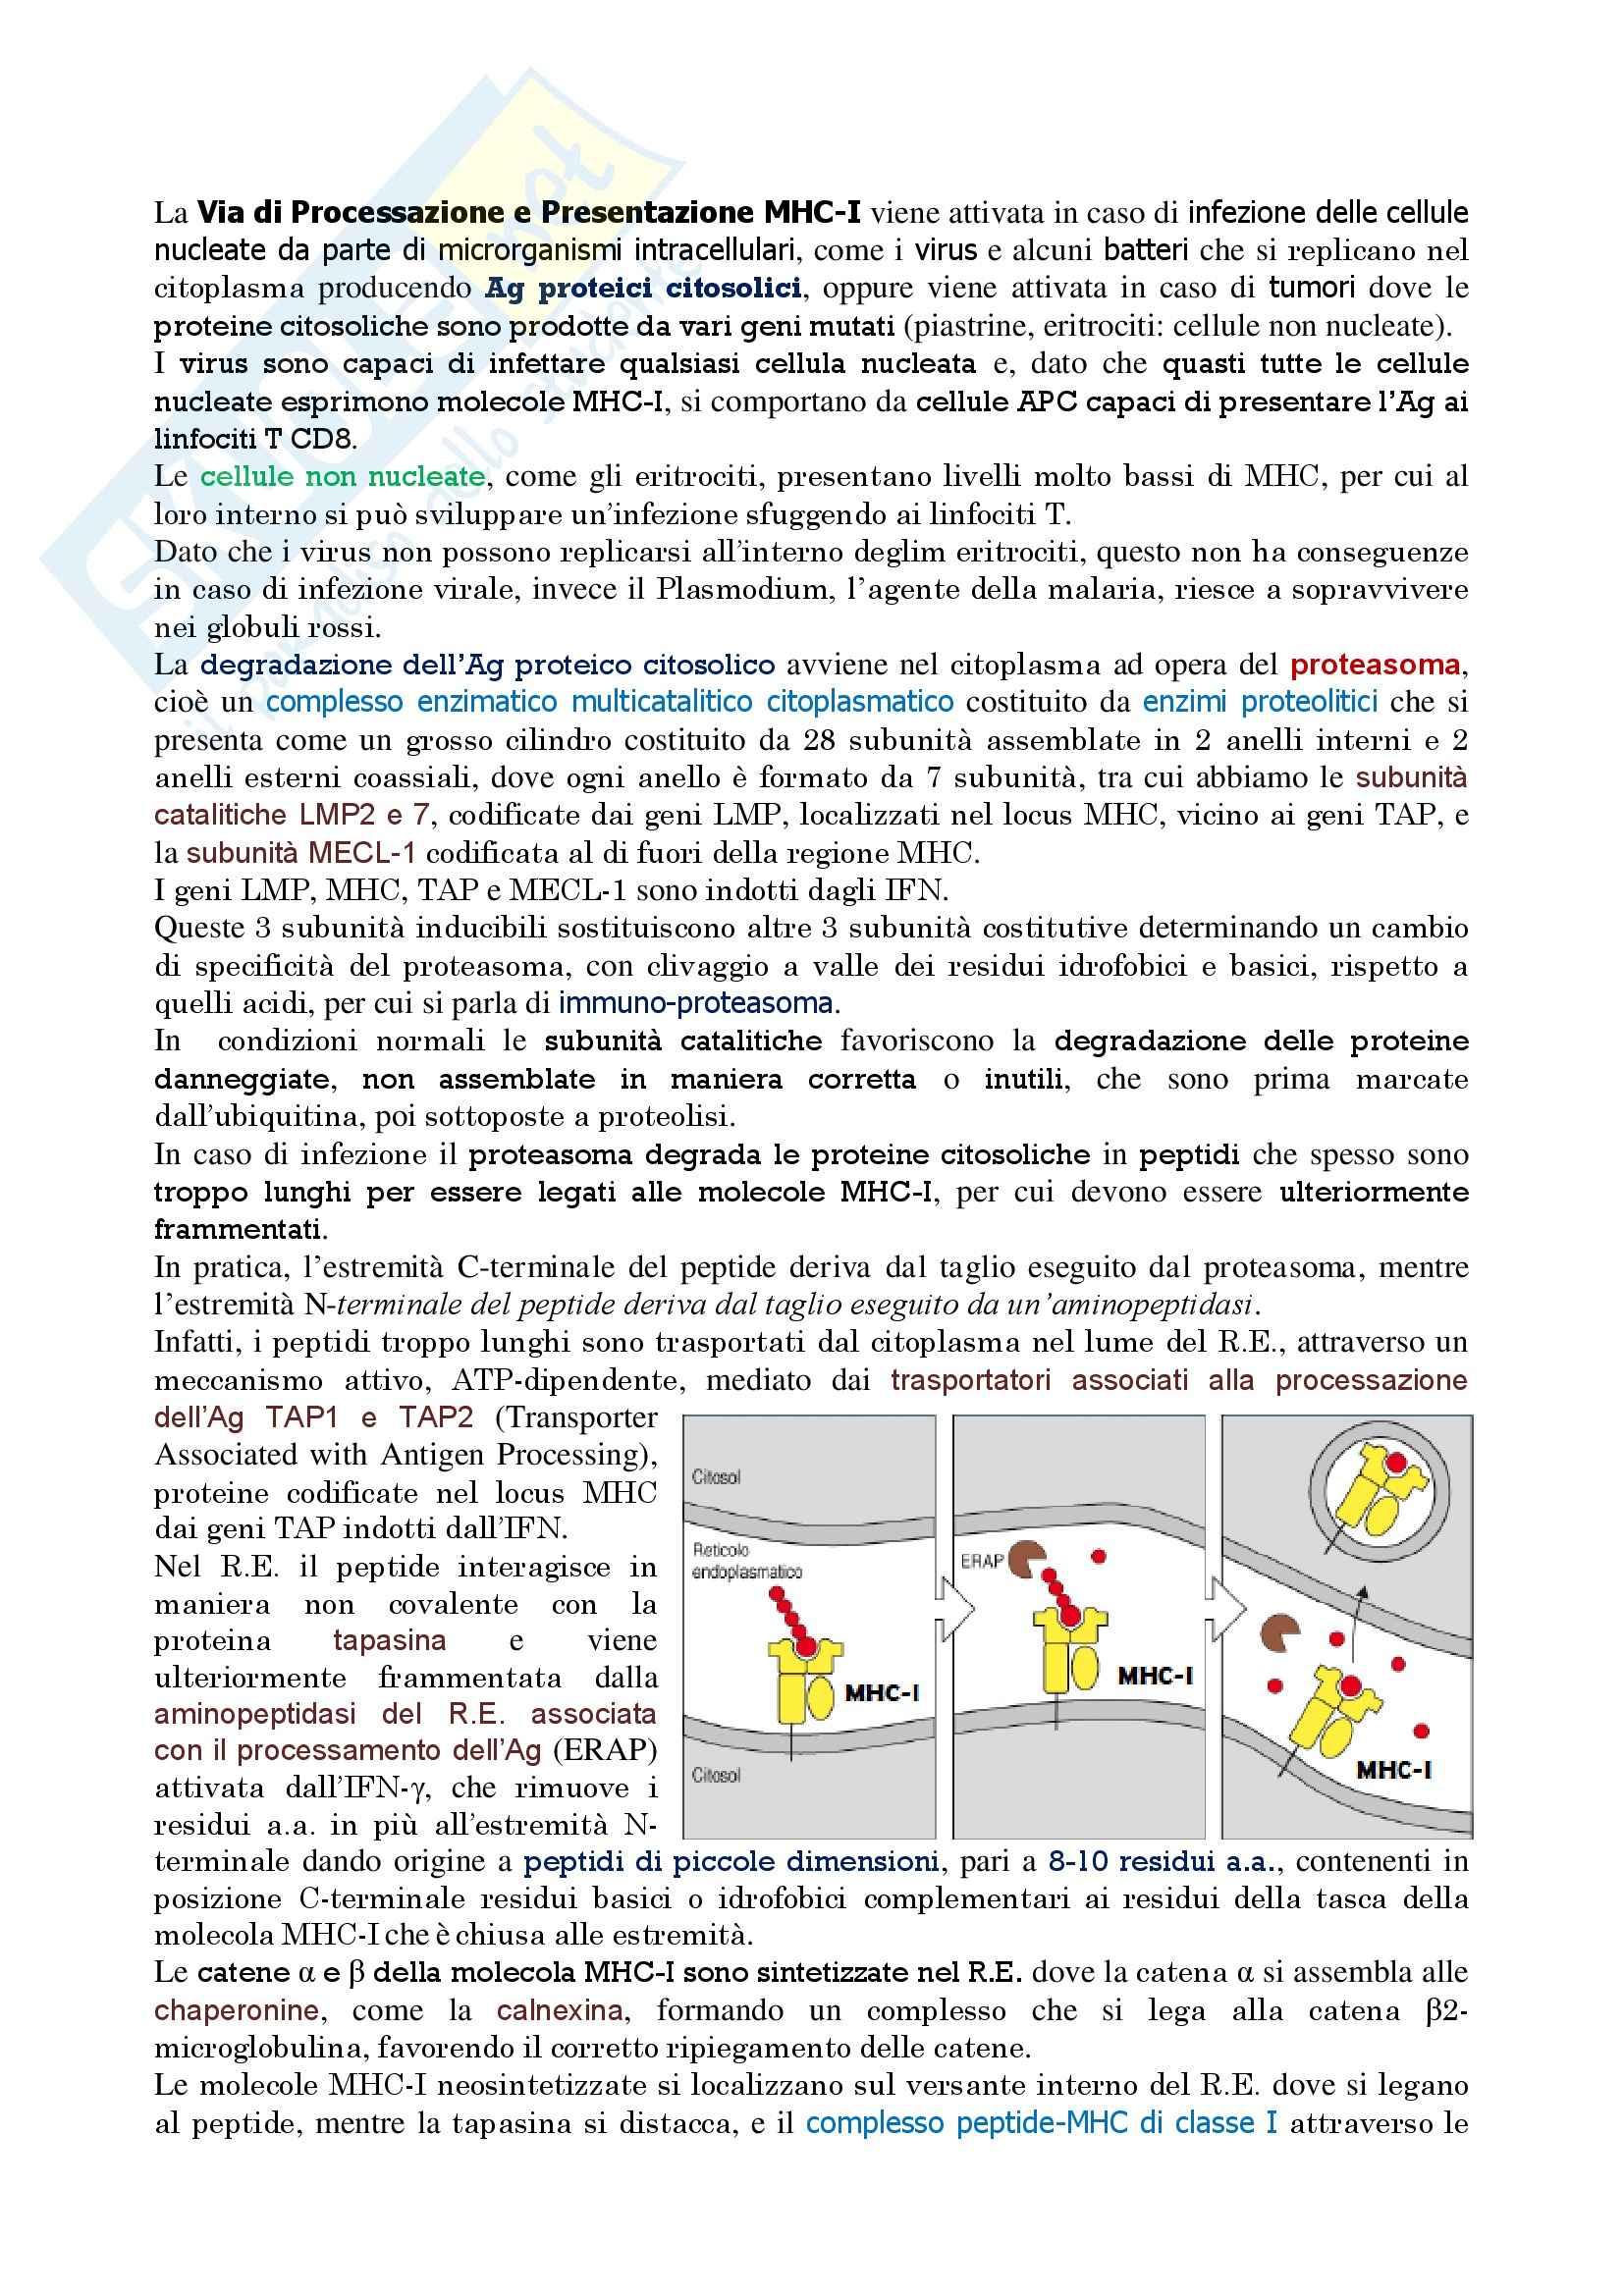 Immunologia – via di processazione e presentazione MHC-I